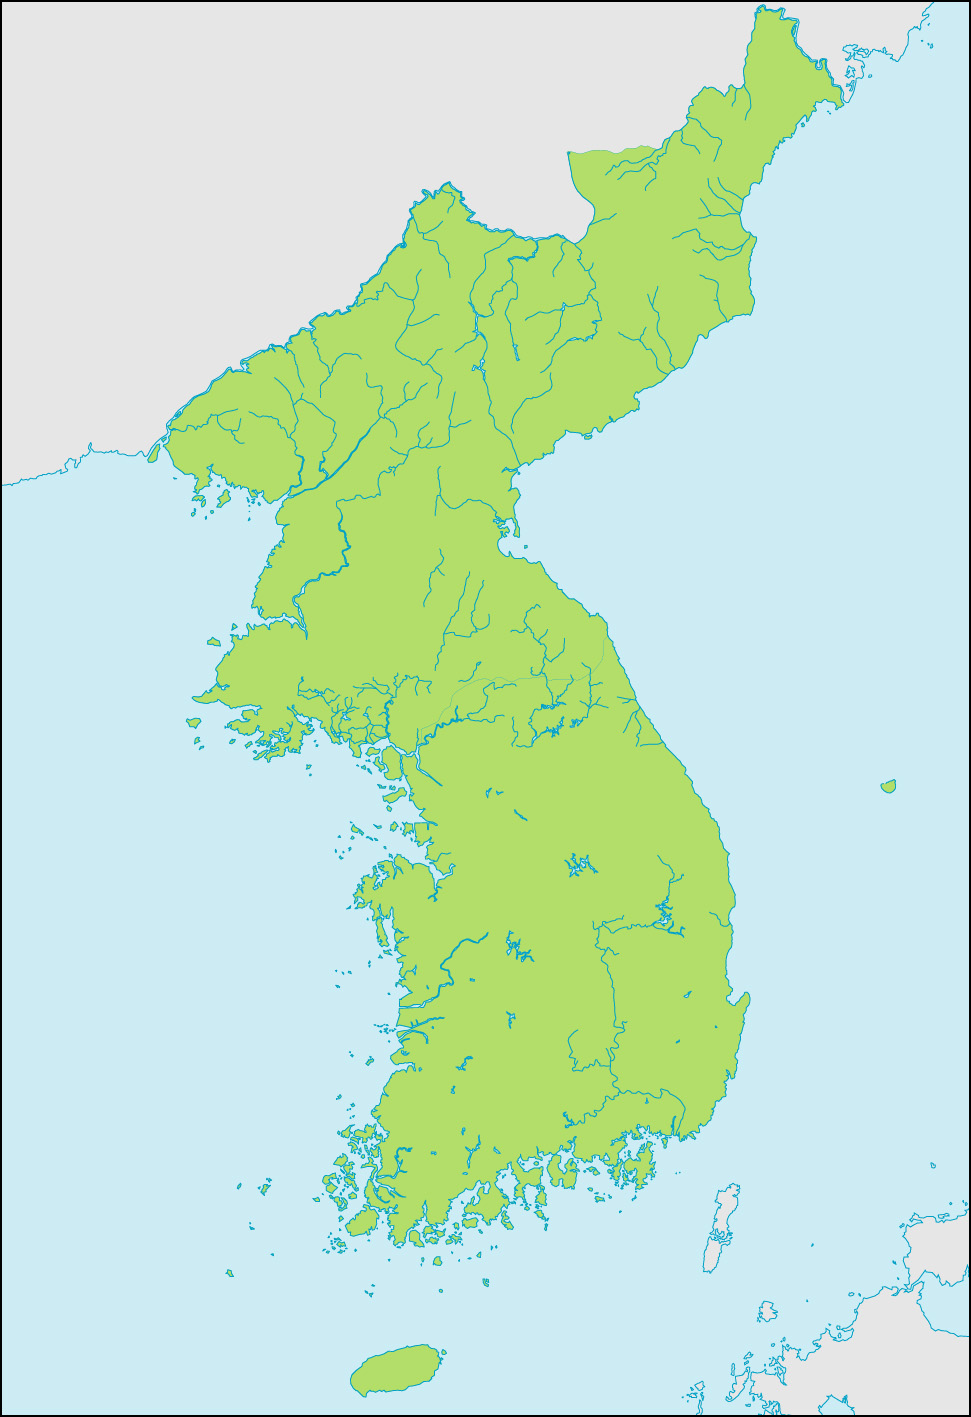 朝鮮半島地図の画像